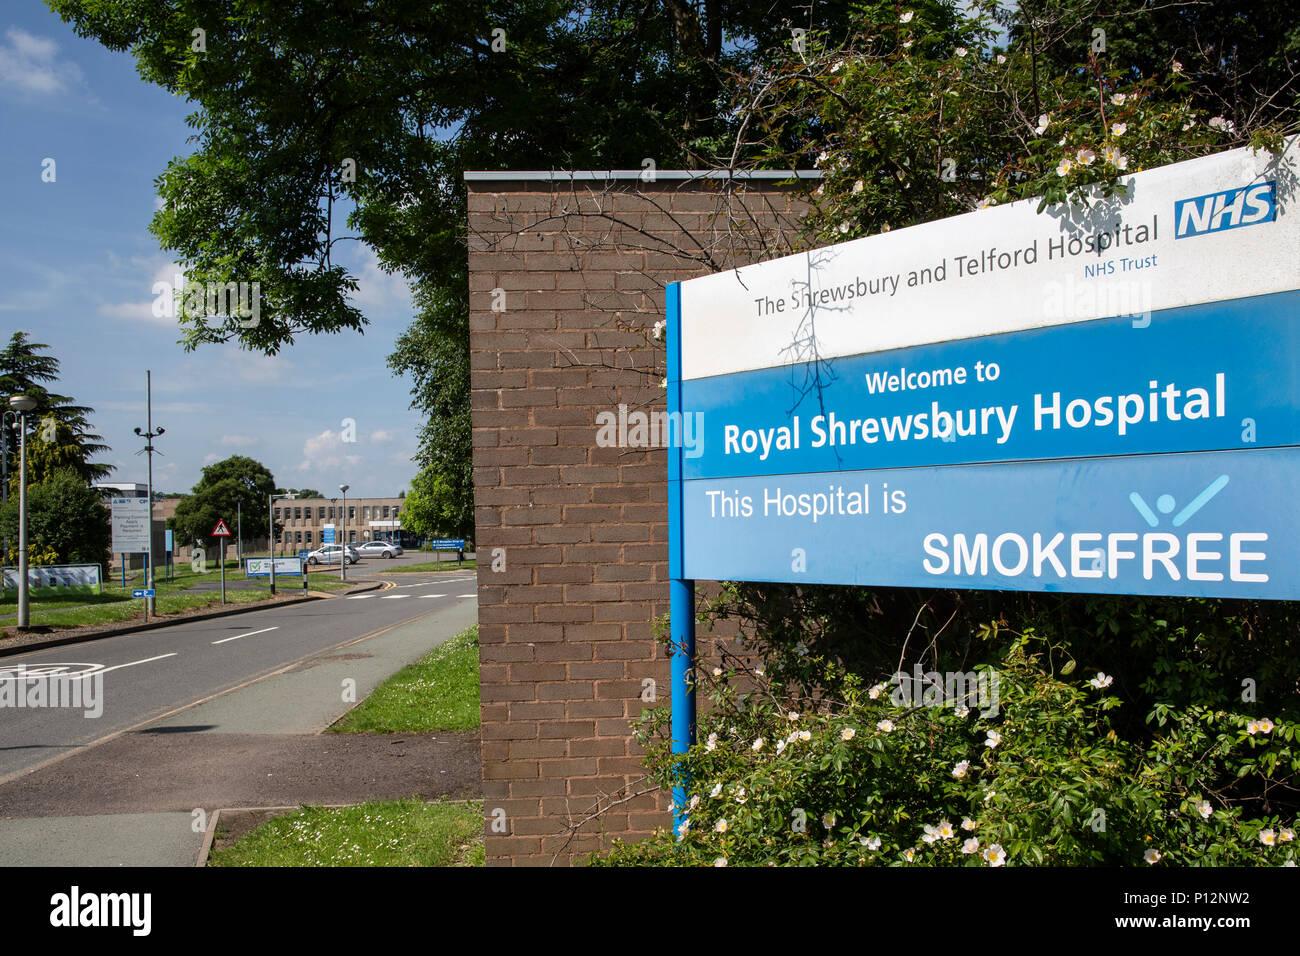 The Royal Shrewsbury Hospital in Shrewsbury Shropshire UK and NHS hospital serving Shropshire, west midlands and Wales - Stock Image